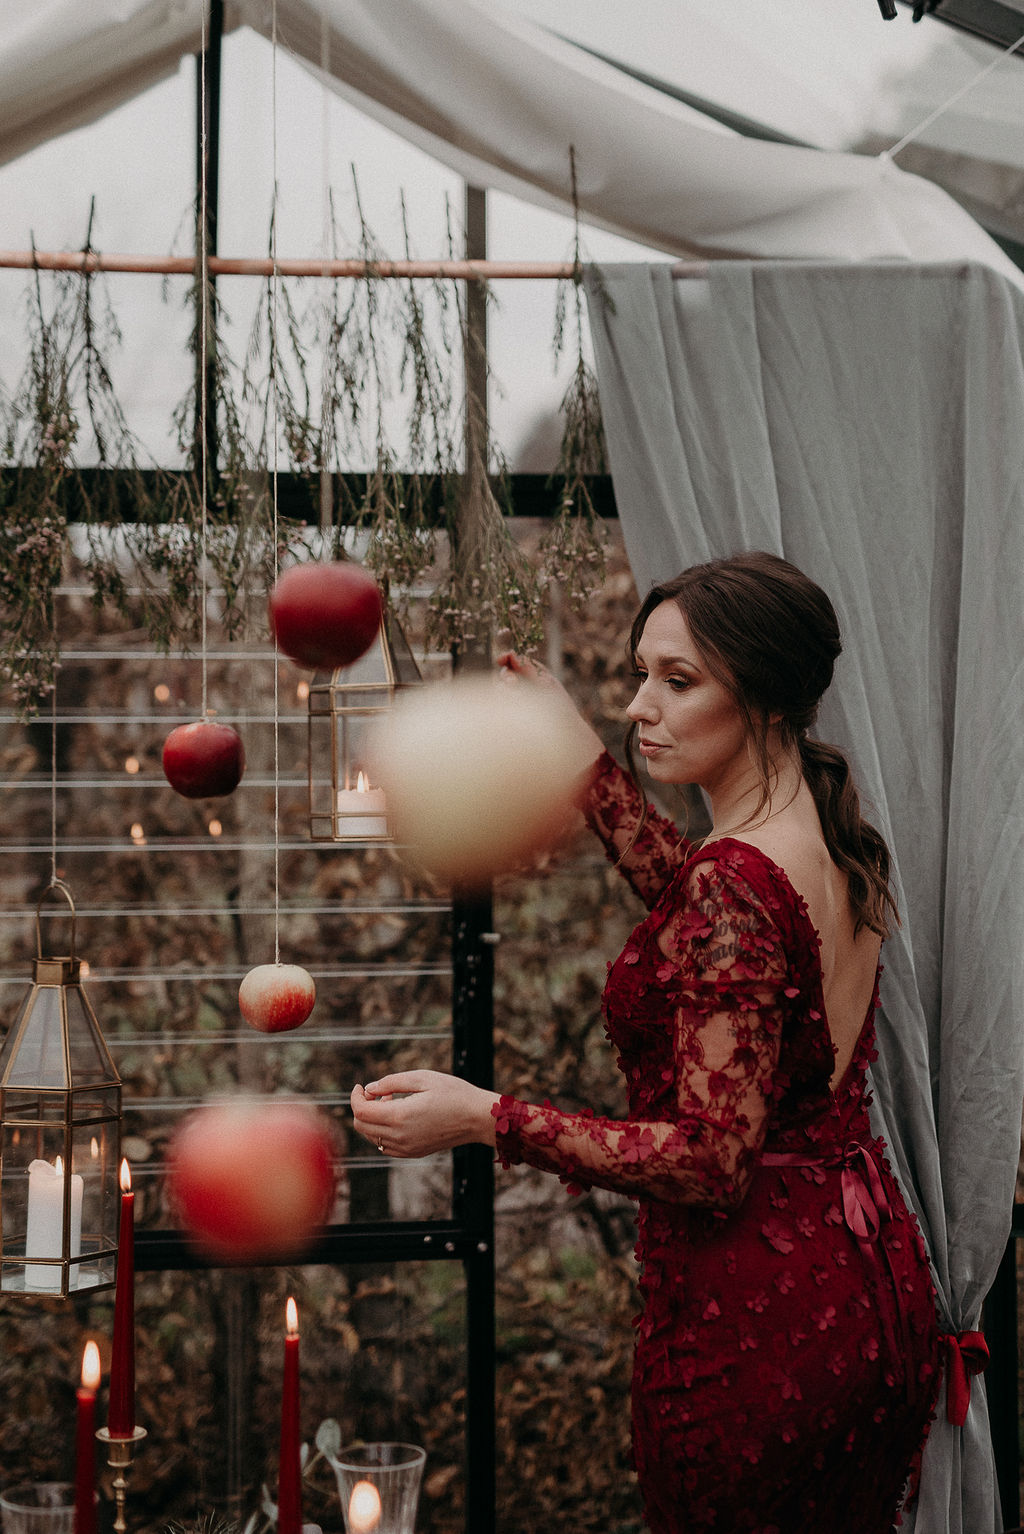 Julbröllop+vinterbröllop+dukning20.jpg